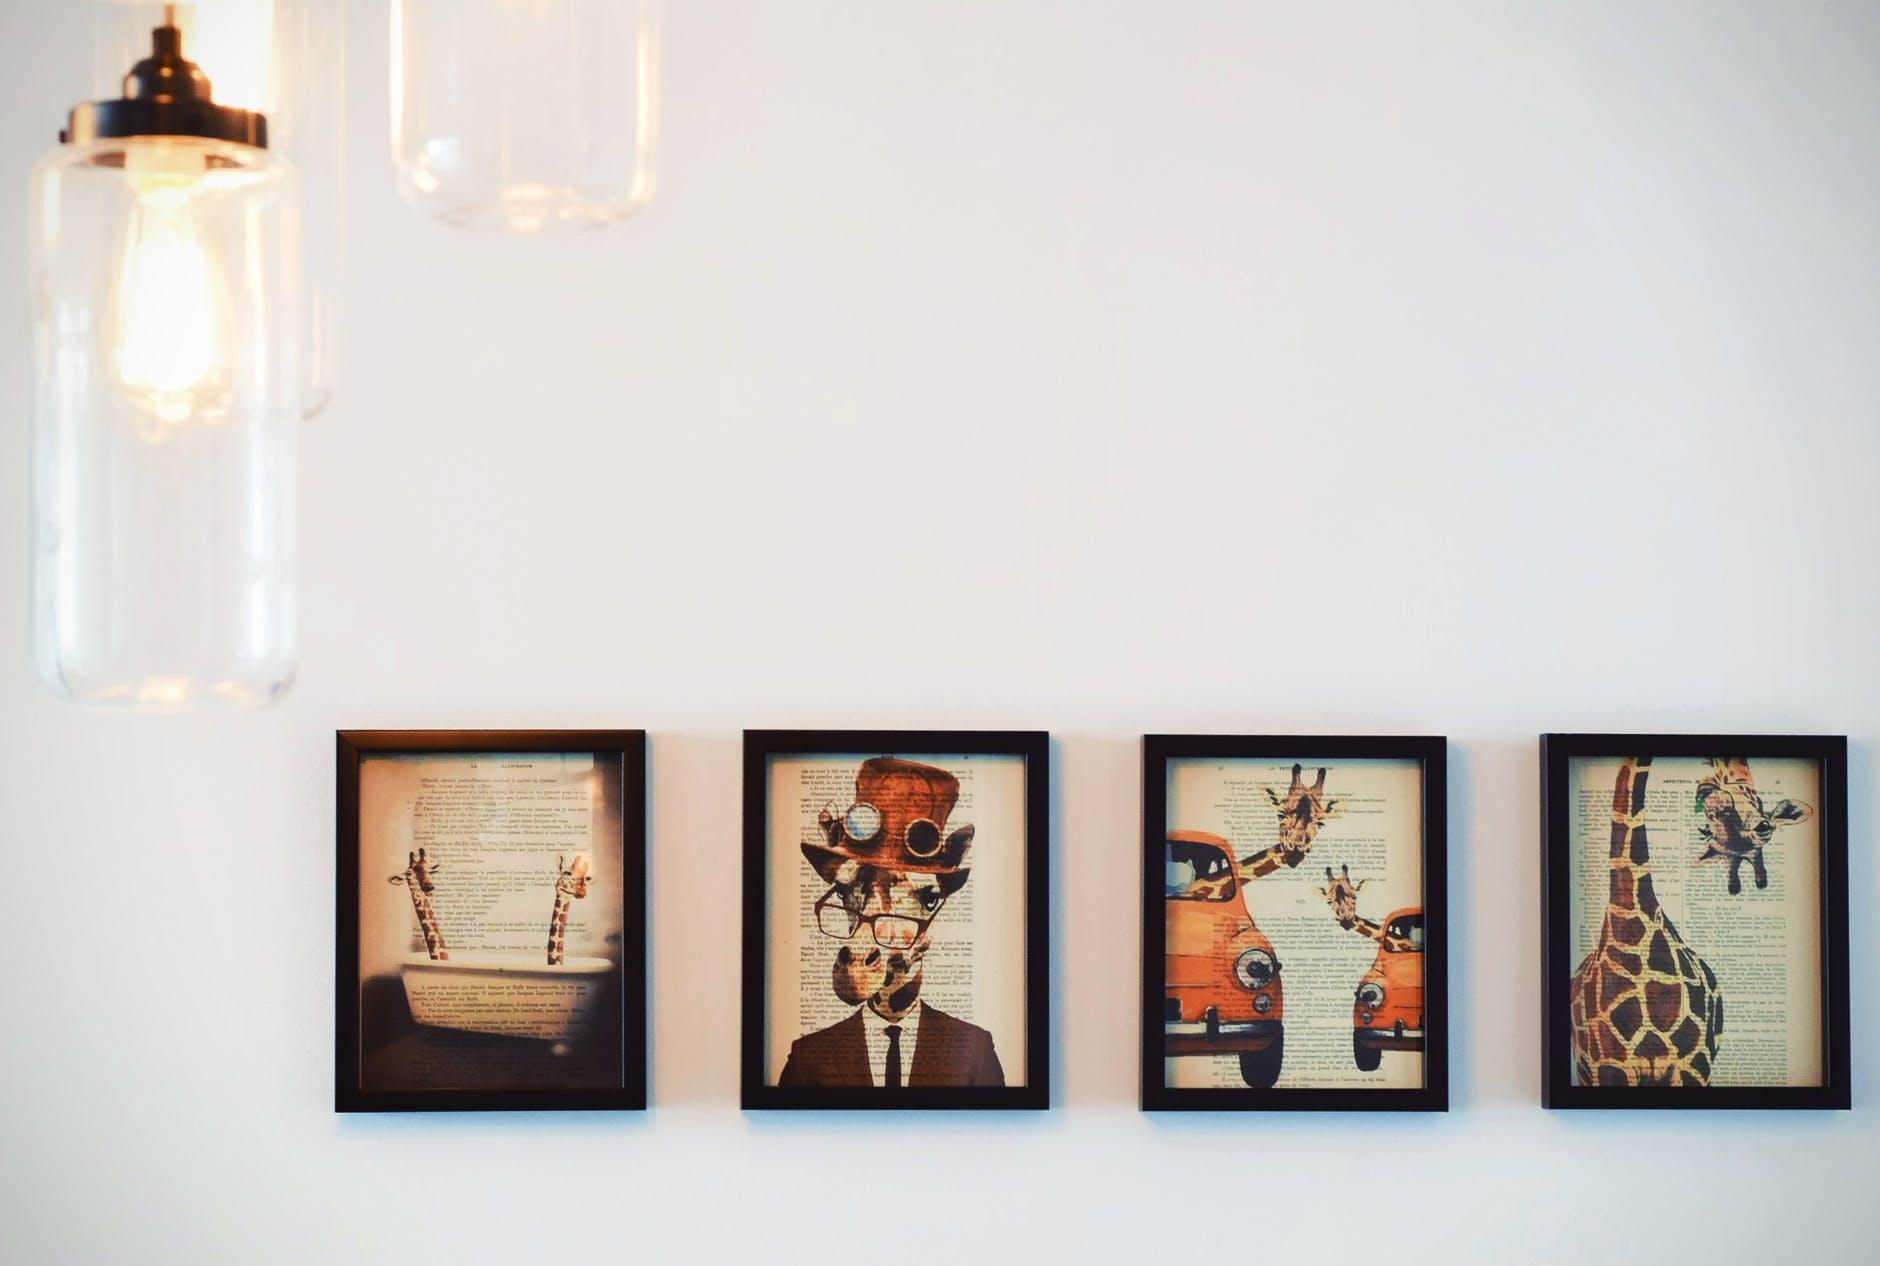 Toronto Photo Framing Store Custom Frames Printing Services